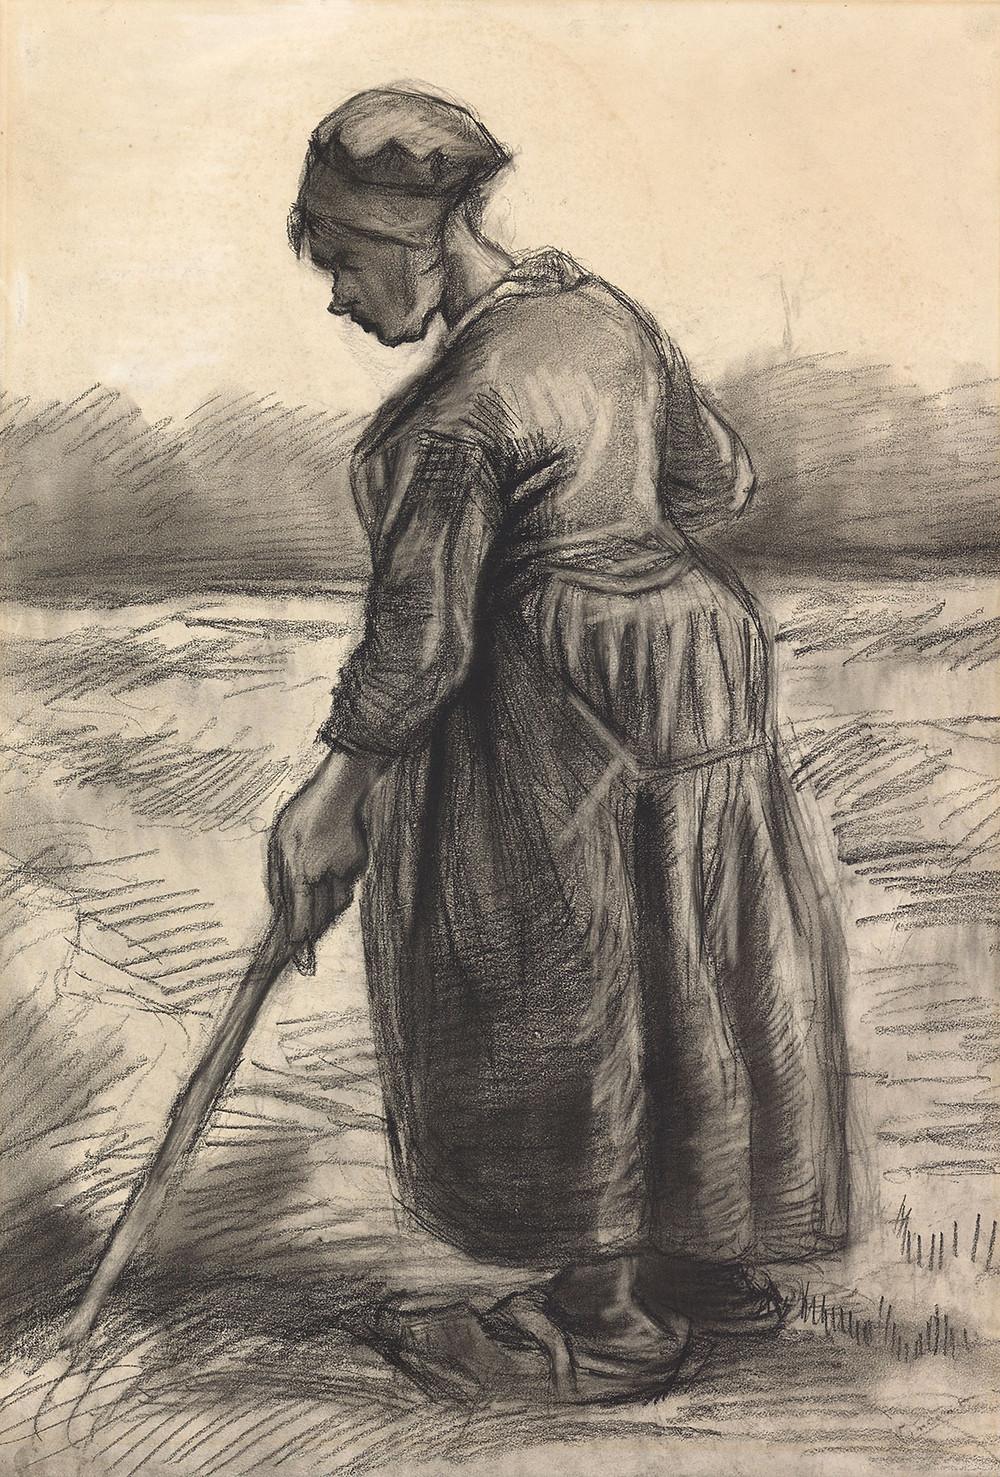 Vincent van Gogh, Bondekone høster, 1885. Coll. Kröller-Müller Museum, Otterlo